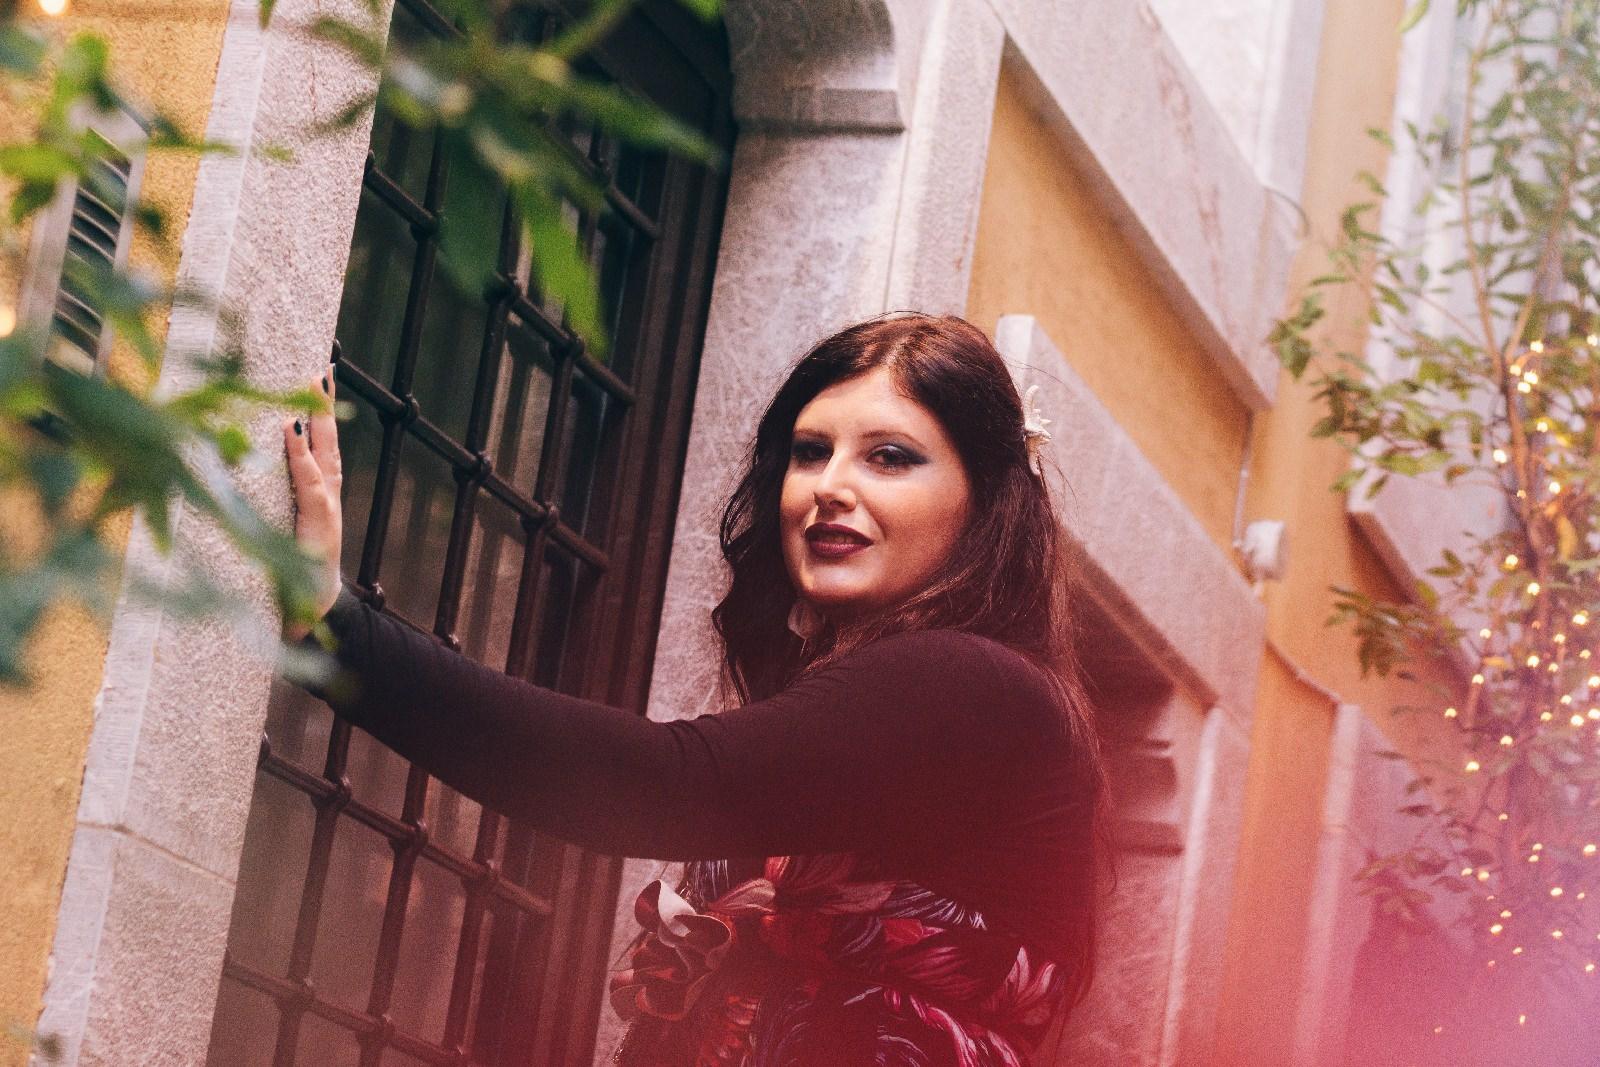 041-2018-09-22-Engagement-Alessandra-e-Igor-Pizzone-035